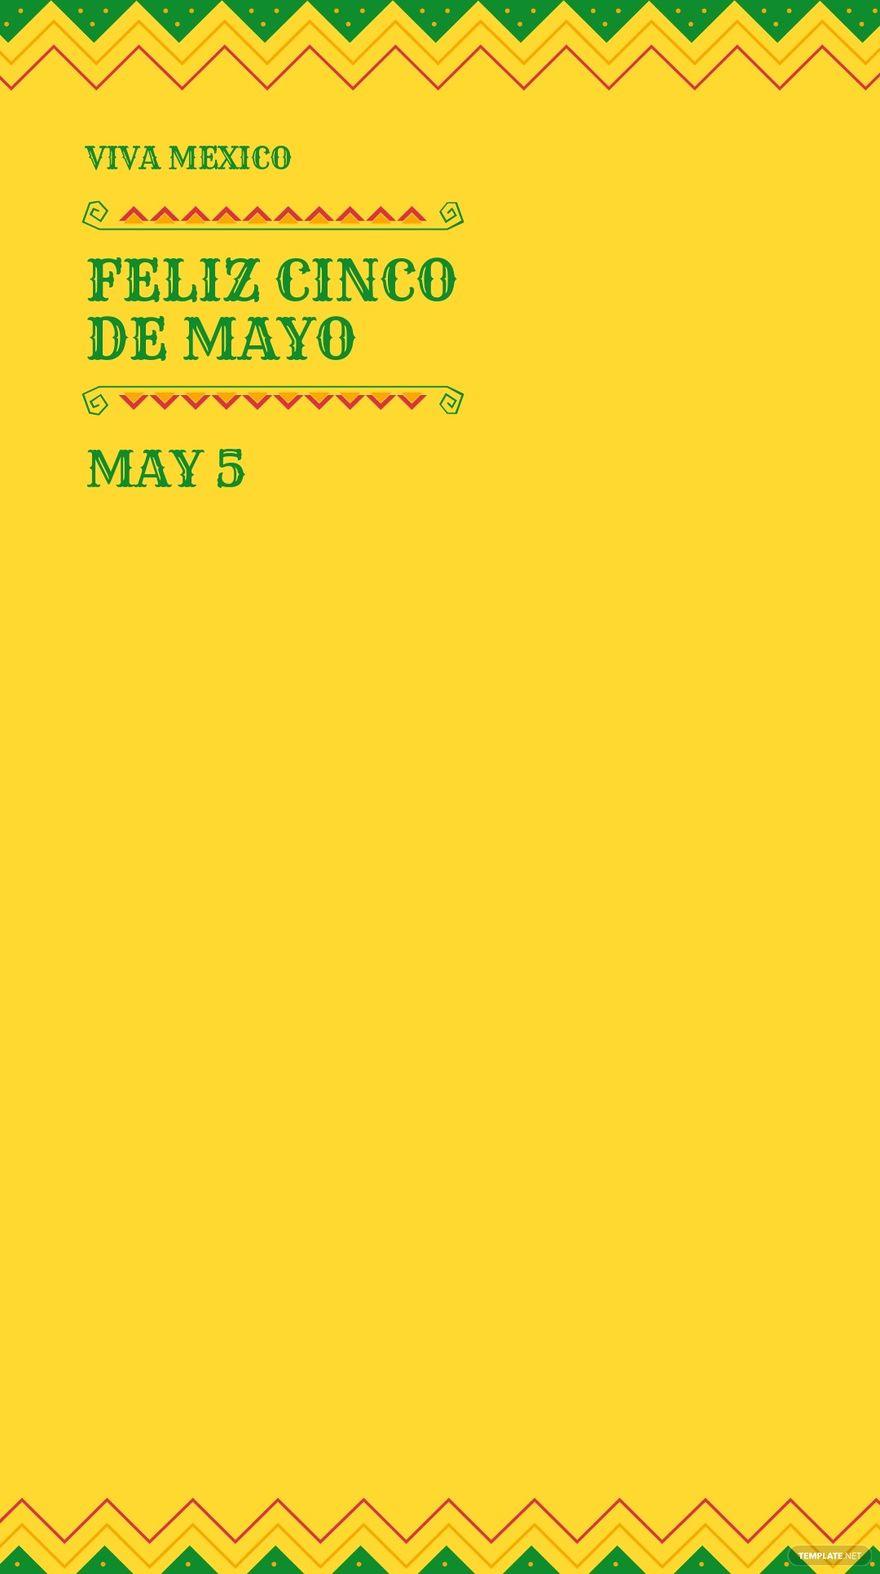 Cinco De Mayo Ad Snapchat Geofilter Template.jpe